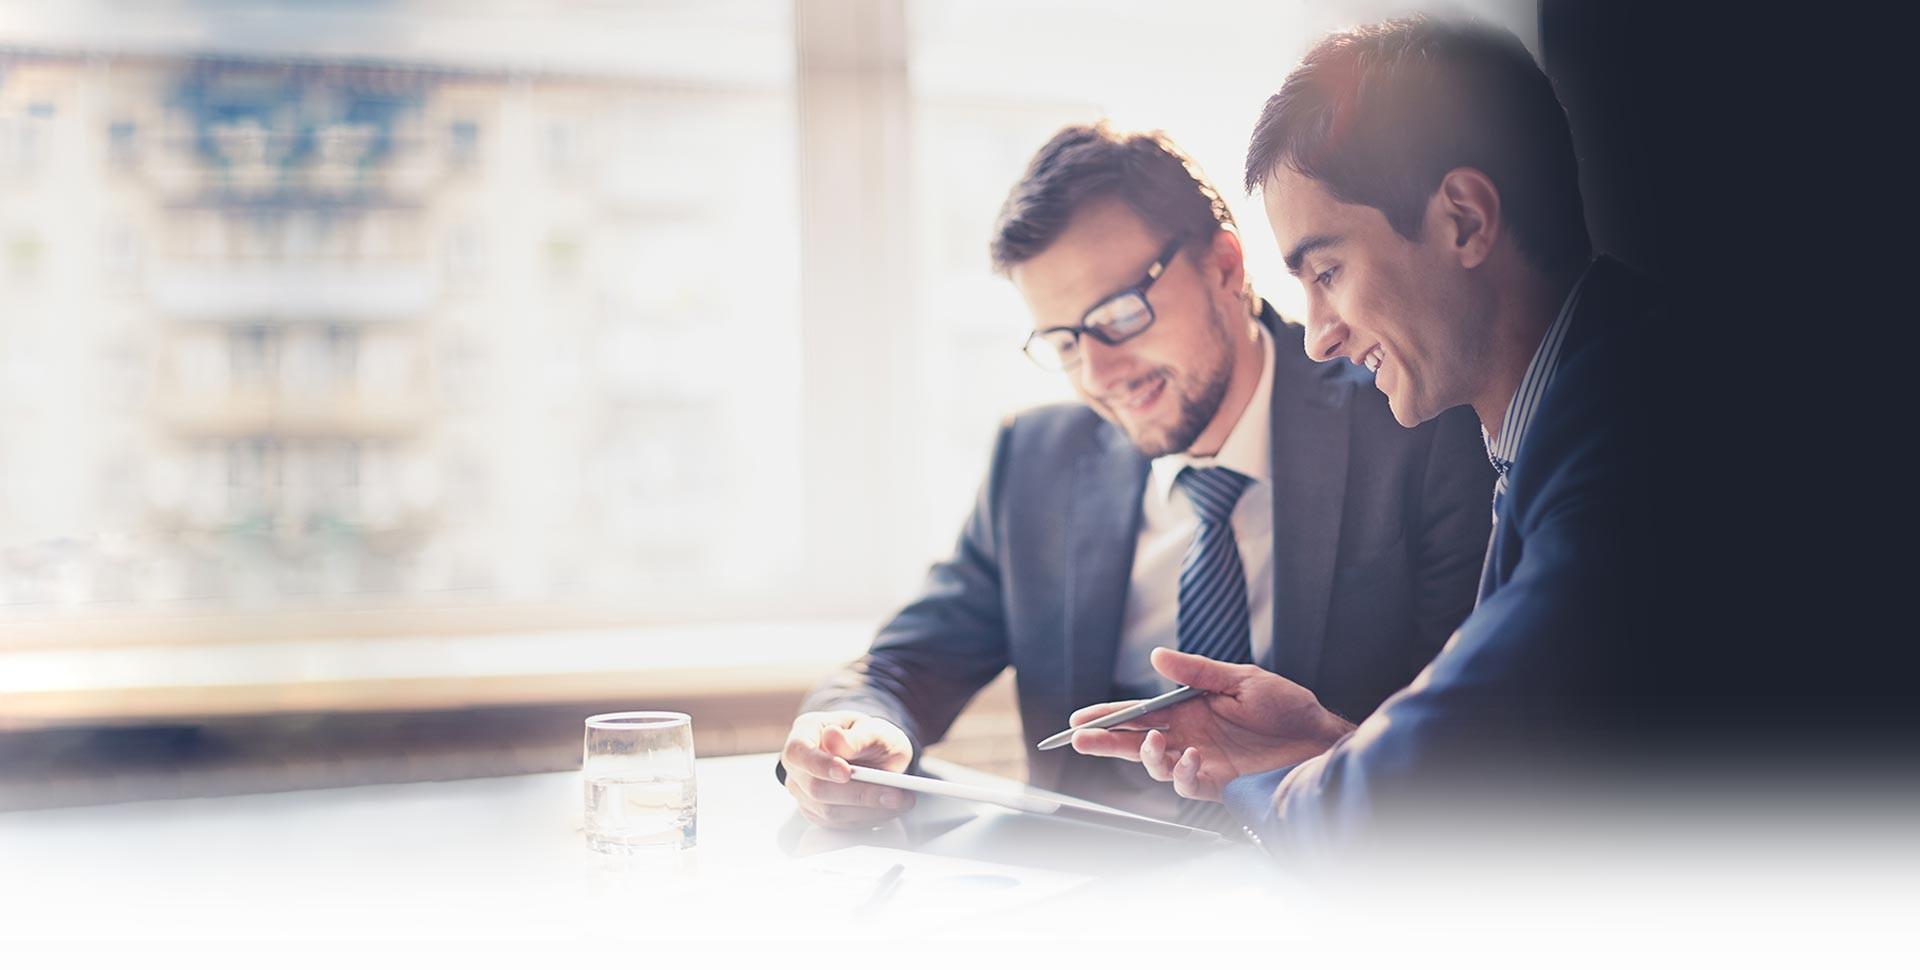 Detalhes - Seguro de Vida PME Previsul